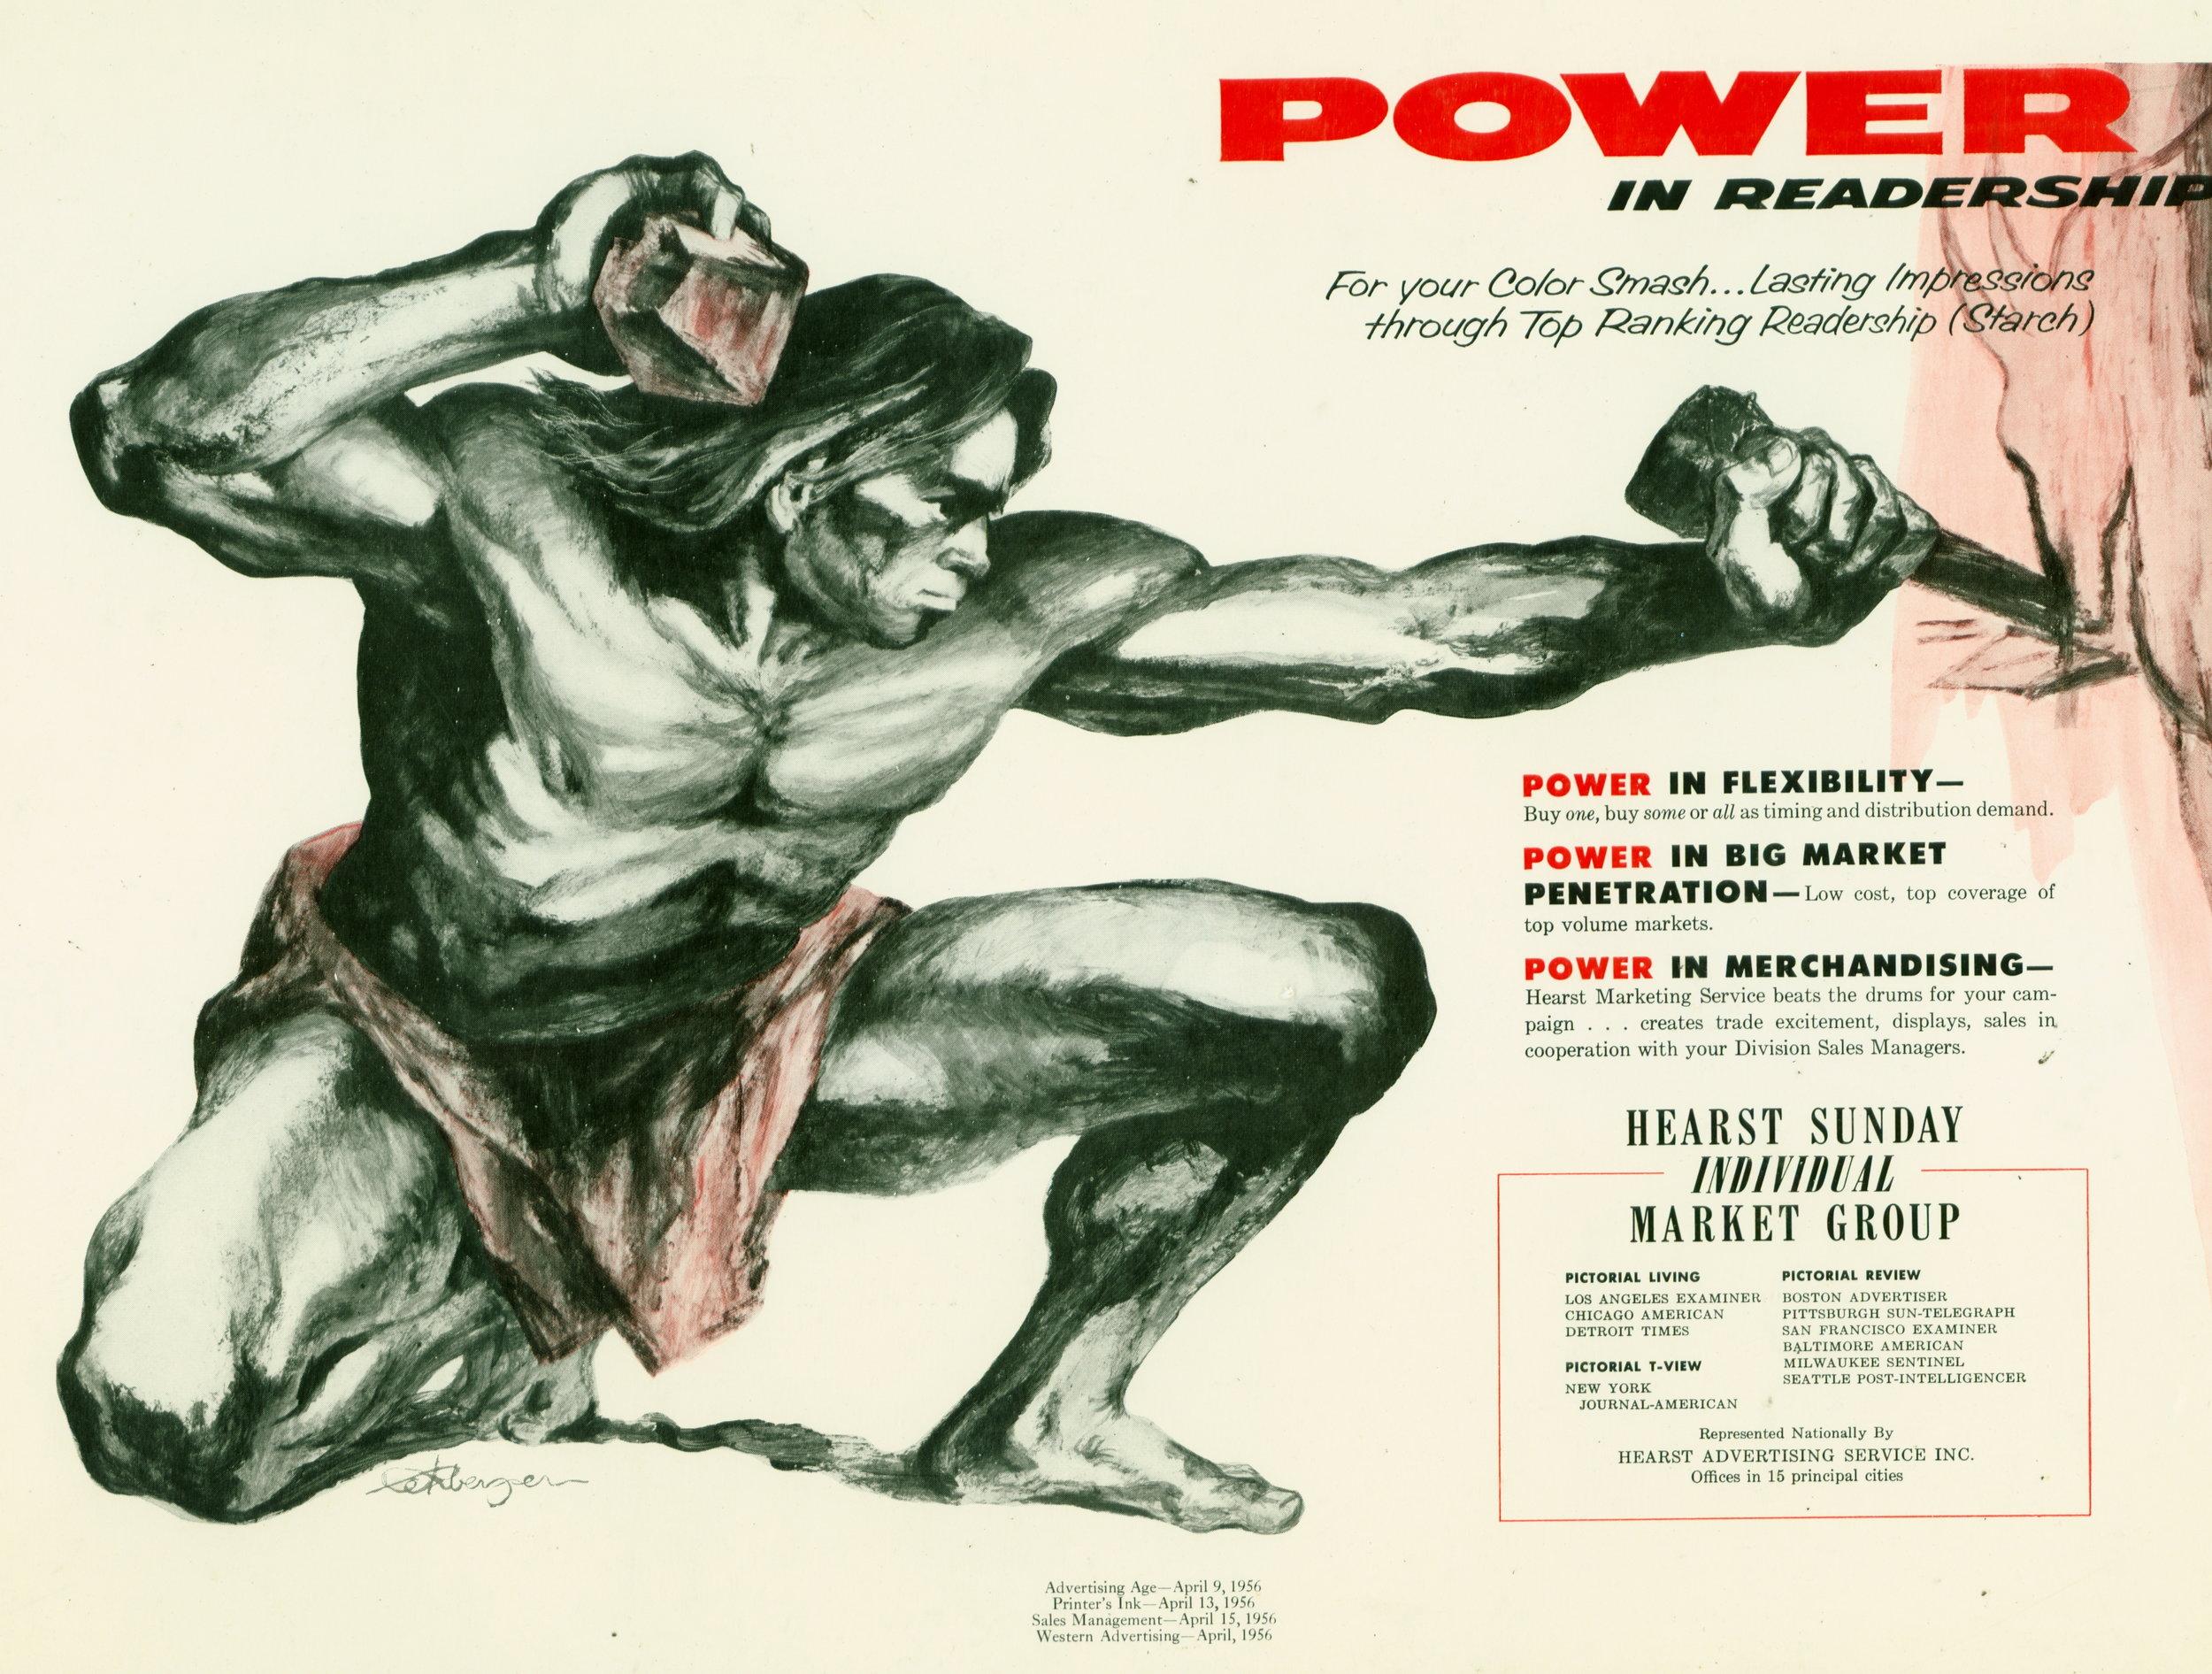 1956 - Power in Readership